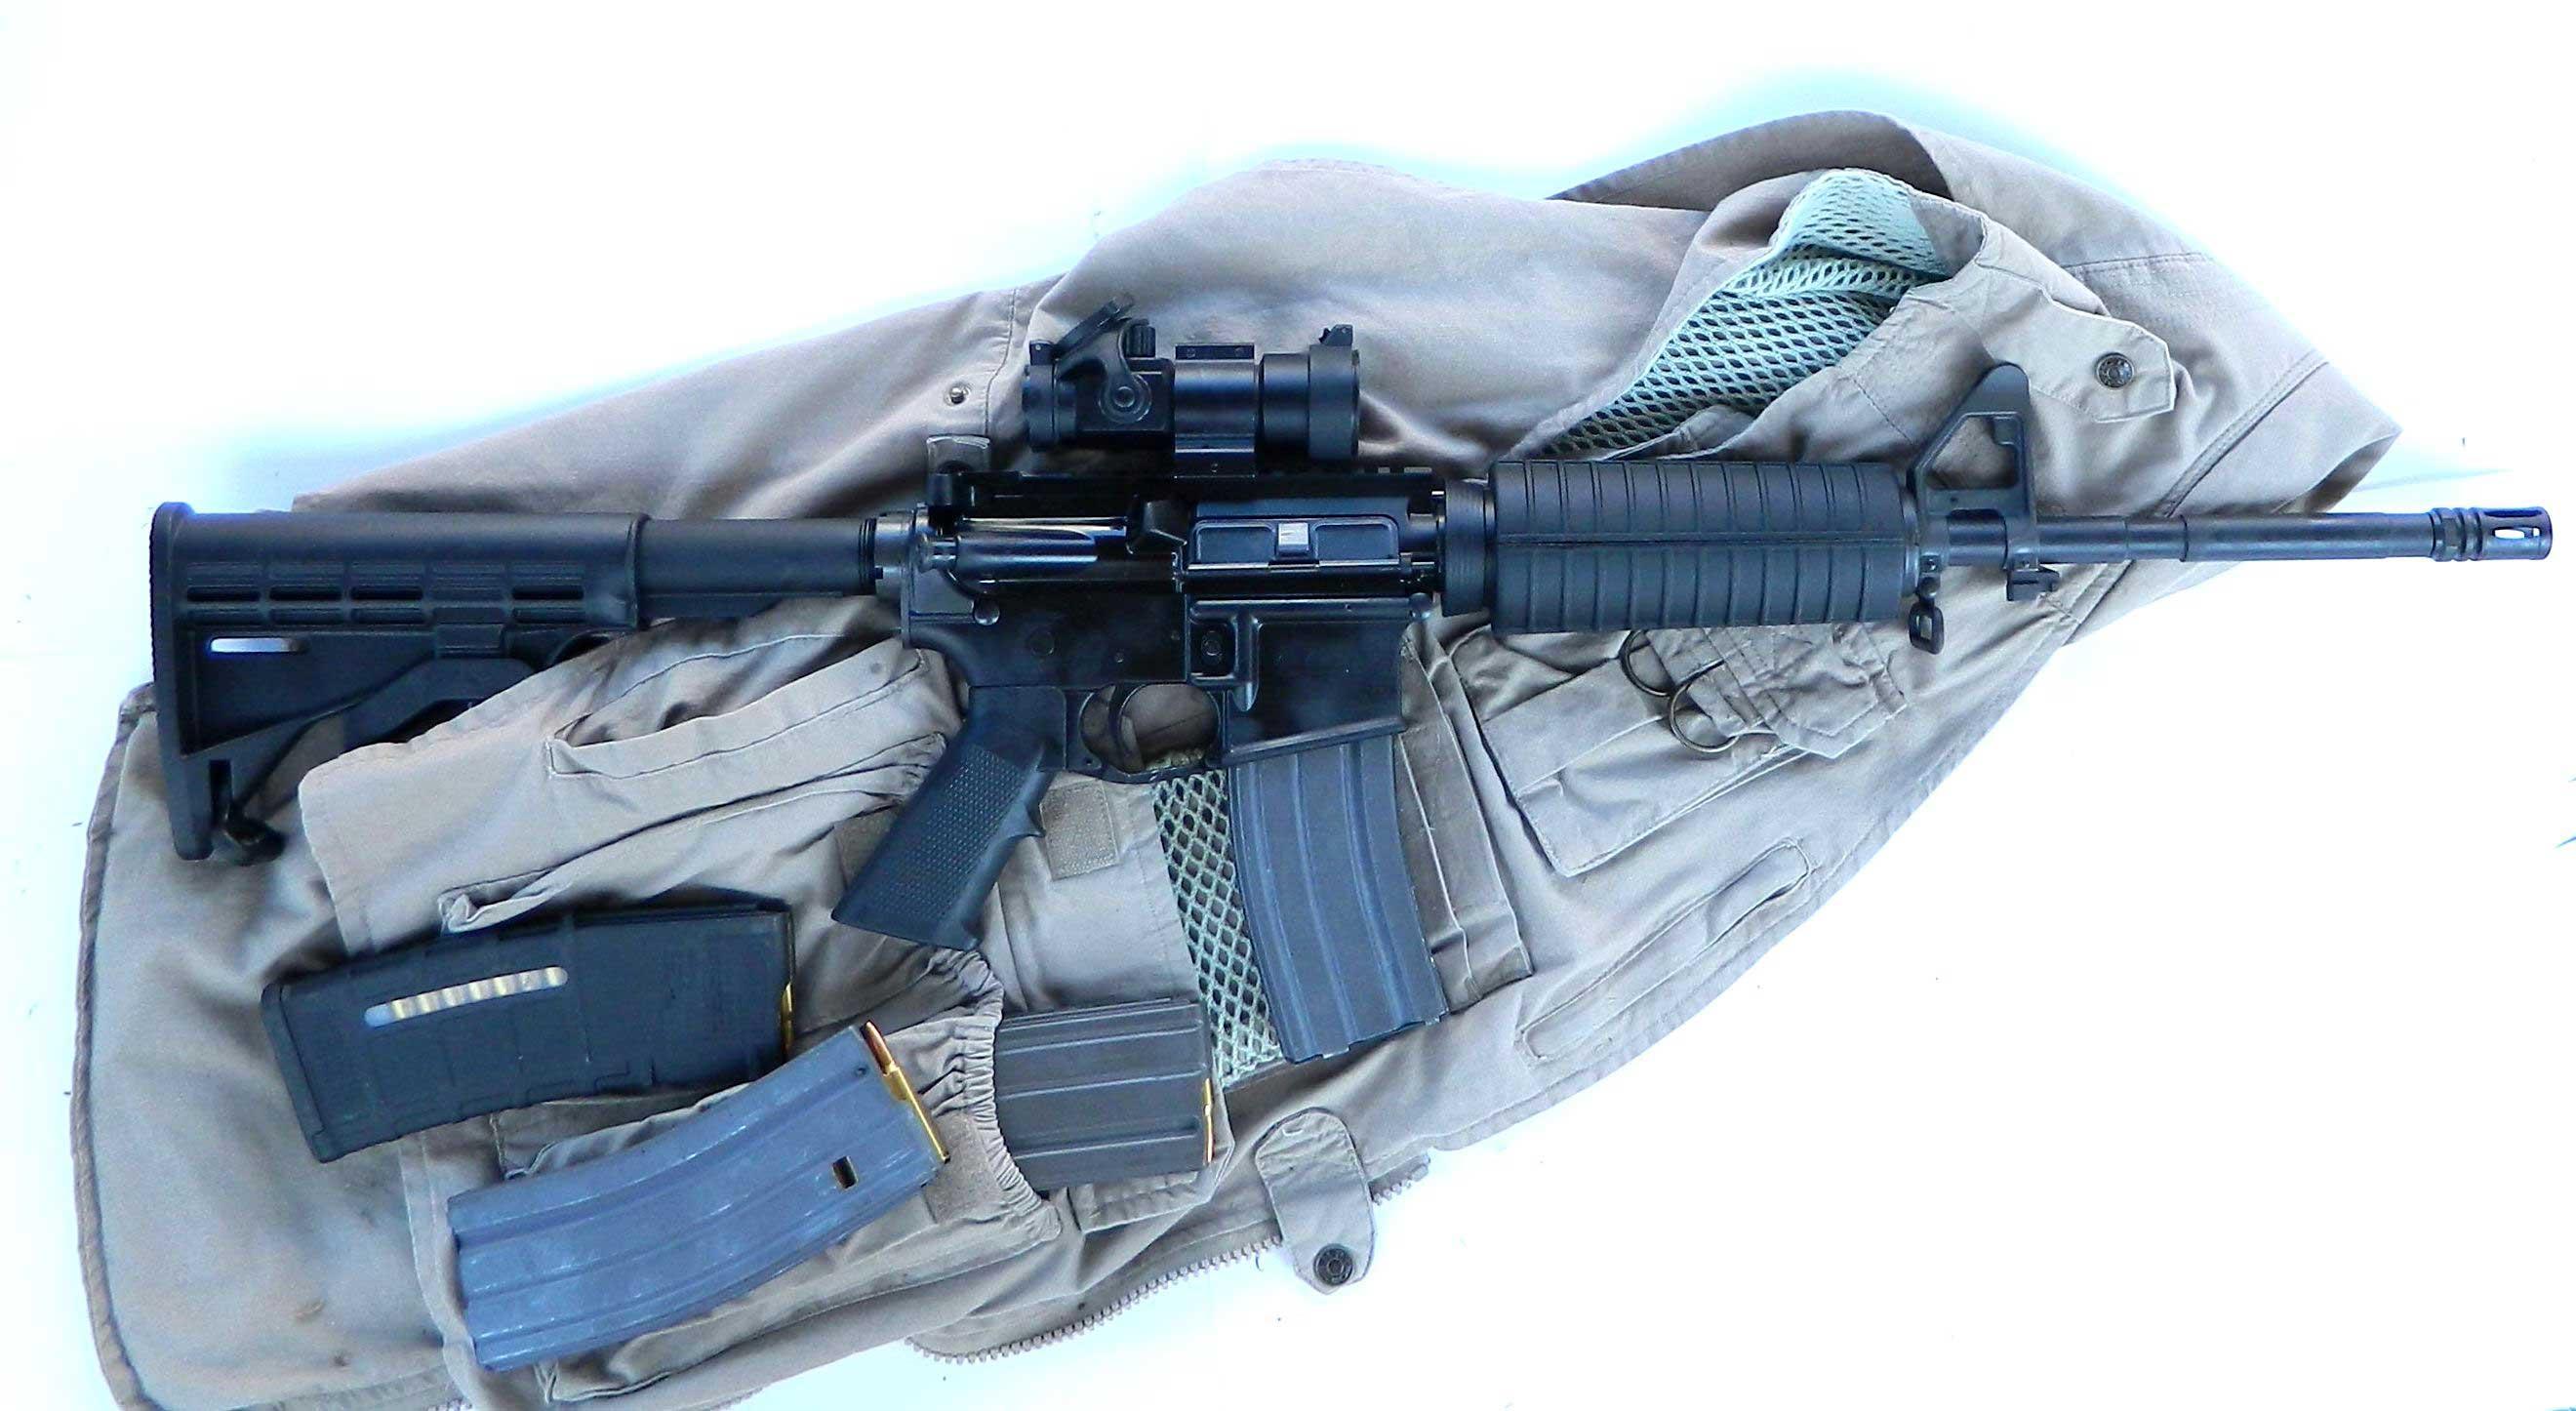 CORE 15 rifle on khaki vest